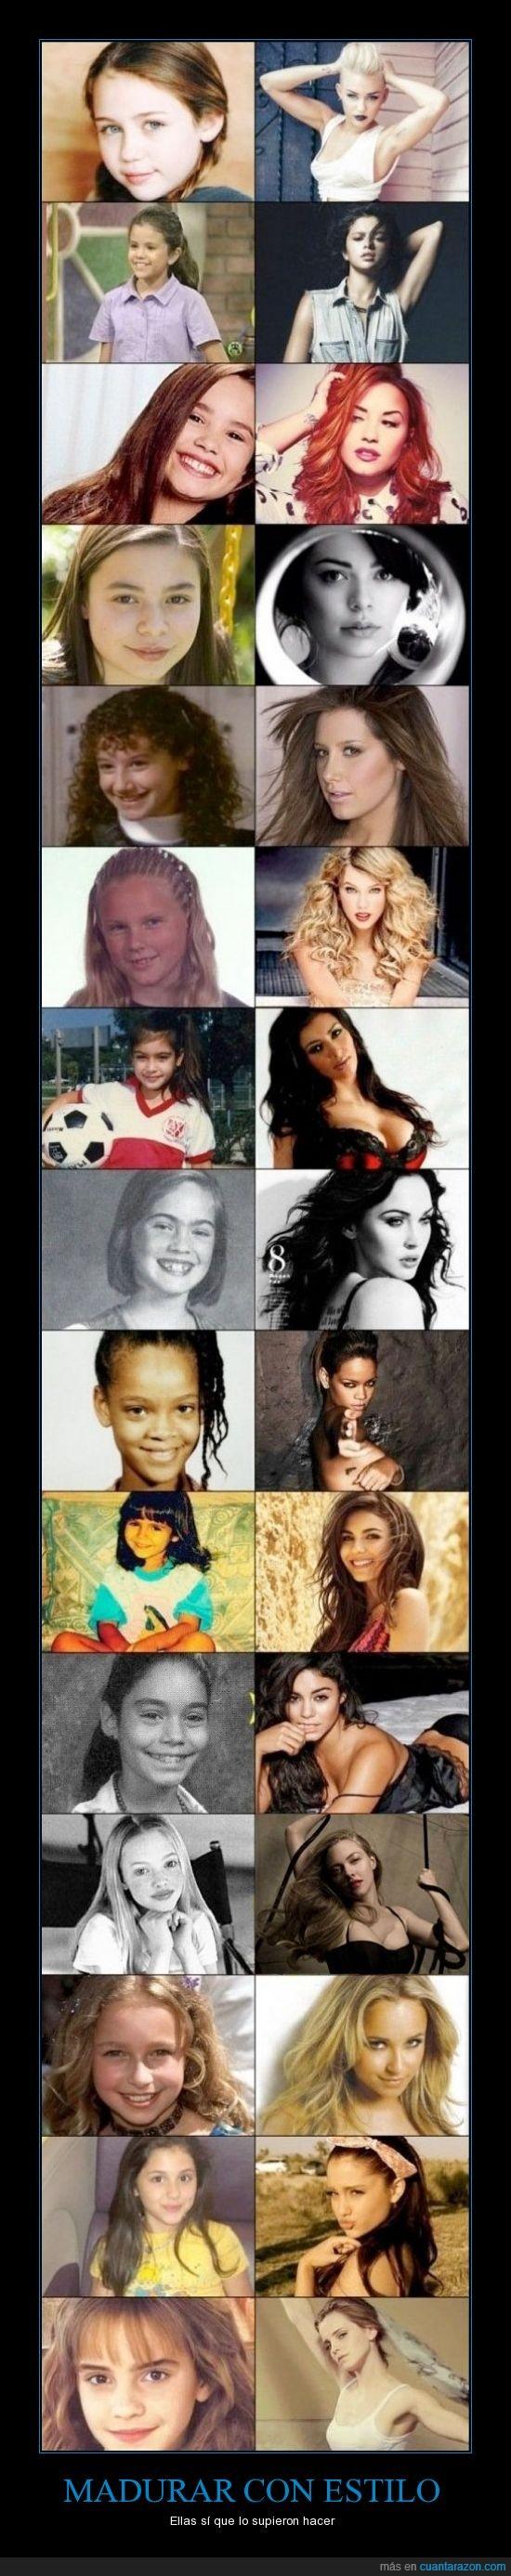 actrices,amanda seyfried,ashley,crecer,demi,emma watson,estilo,hayden,hermione,madurar,megan fox,miley,niñas,rihanna,selena,taylor swift,vanessa